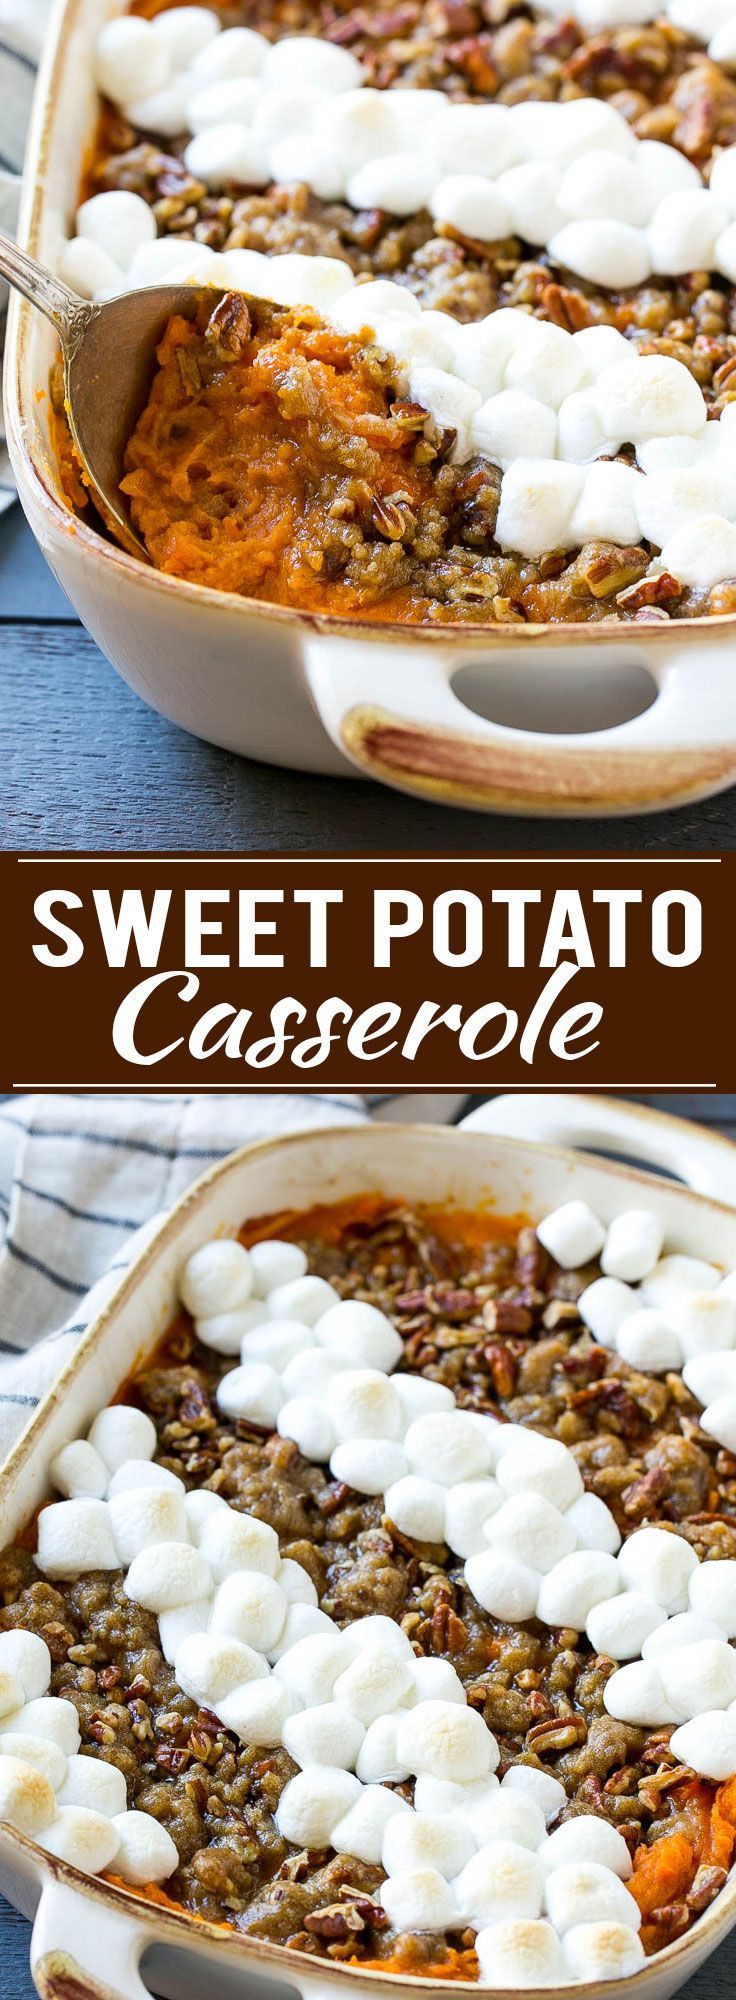 Sweet Potatoes Thanksgiving Marshmallows  Sweet Potato Casserole with Marshmallows